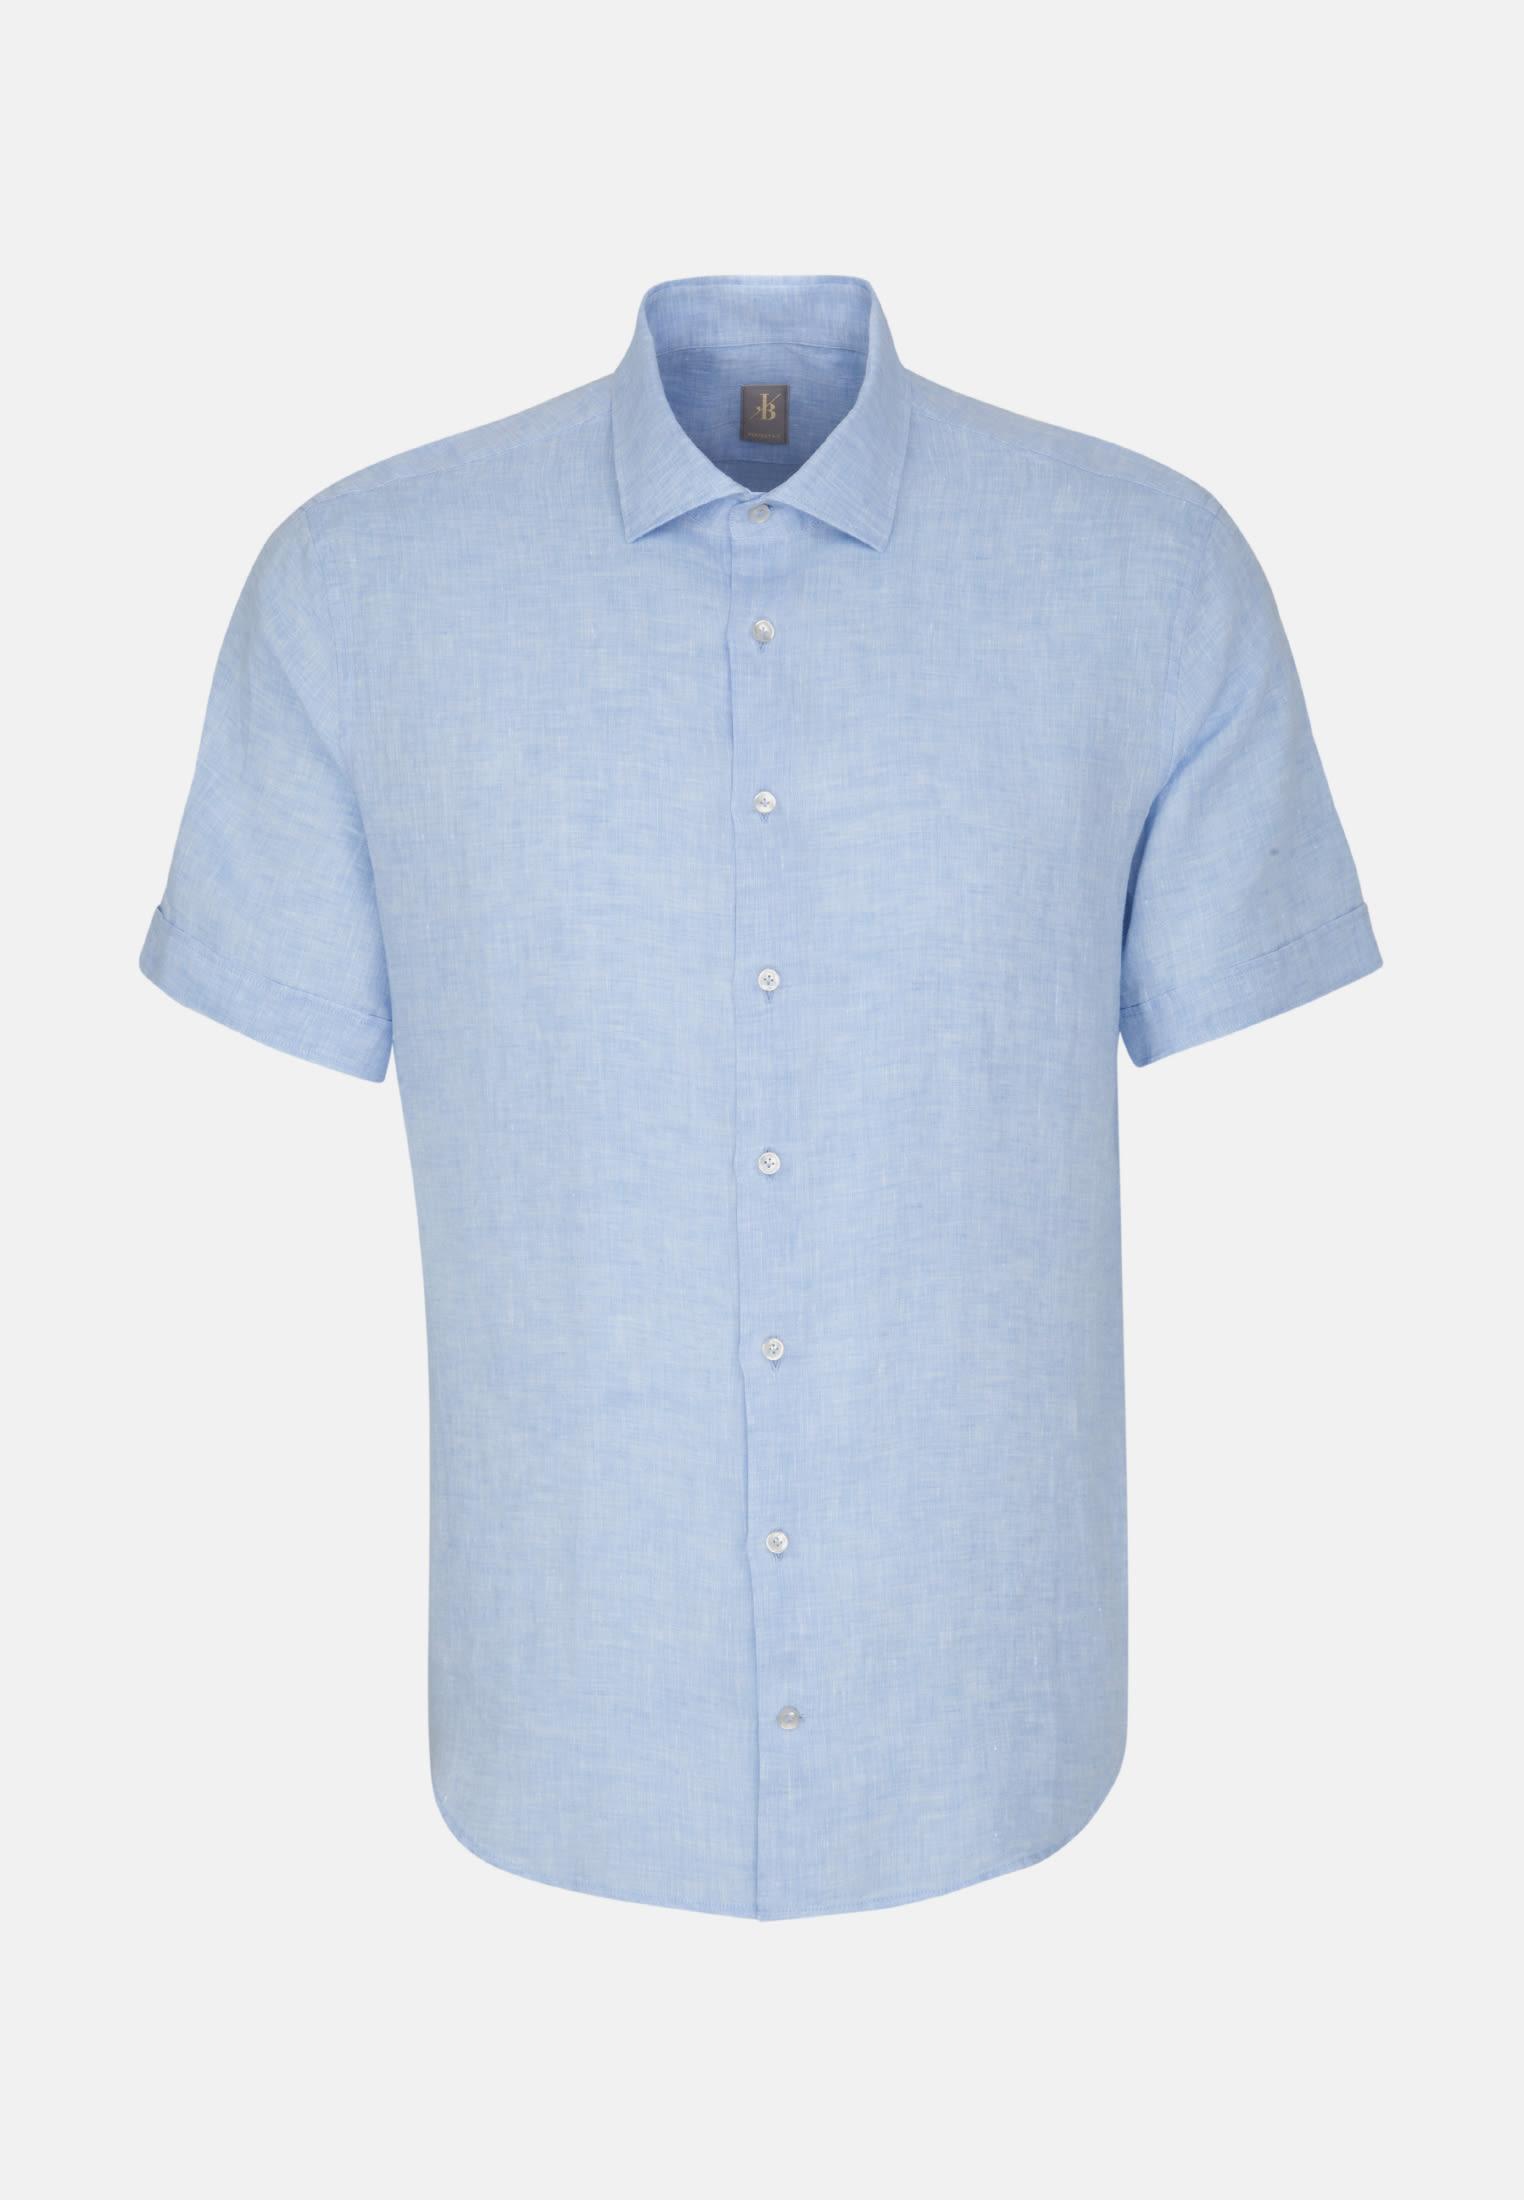 Leinen Smart Casual Hemd in Perfect Fit mit Kentkragen in Hellblau |  Jacques Britt Onlineshop